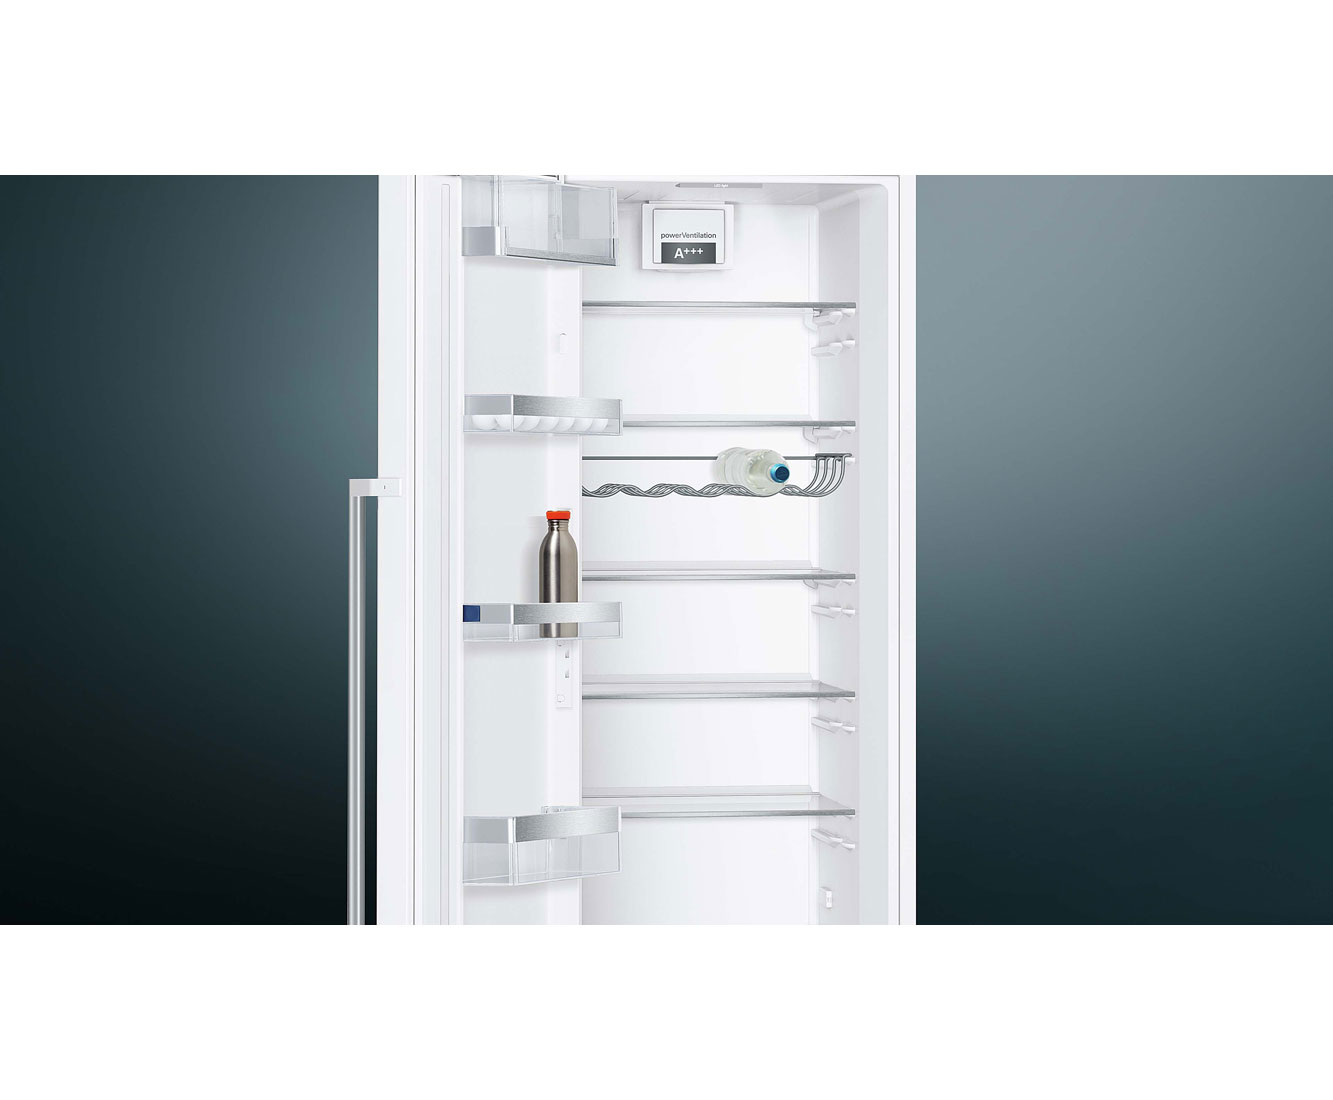 Siemens Kühlschrank Power Ventilation : Siemens iq ks vaw p kühlschrank weiß a